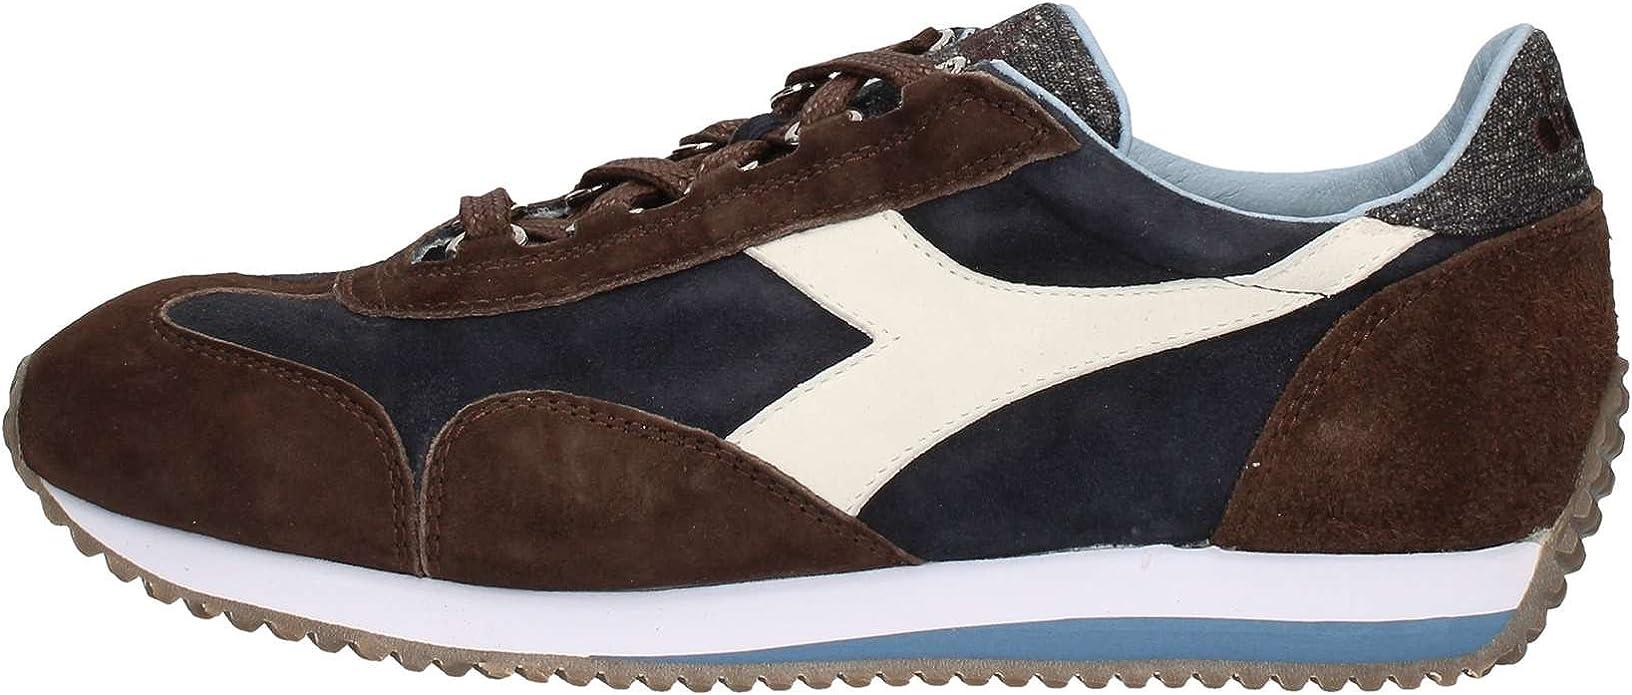 Diadora Heritage Equipe Evo II Sneakers Uomo Blu Corsair art.60063 TG. 40